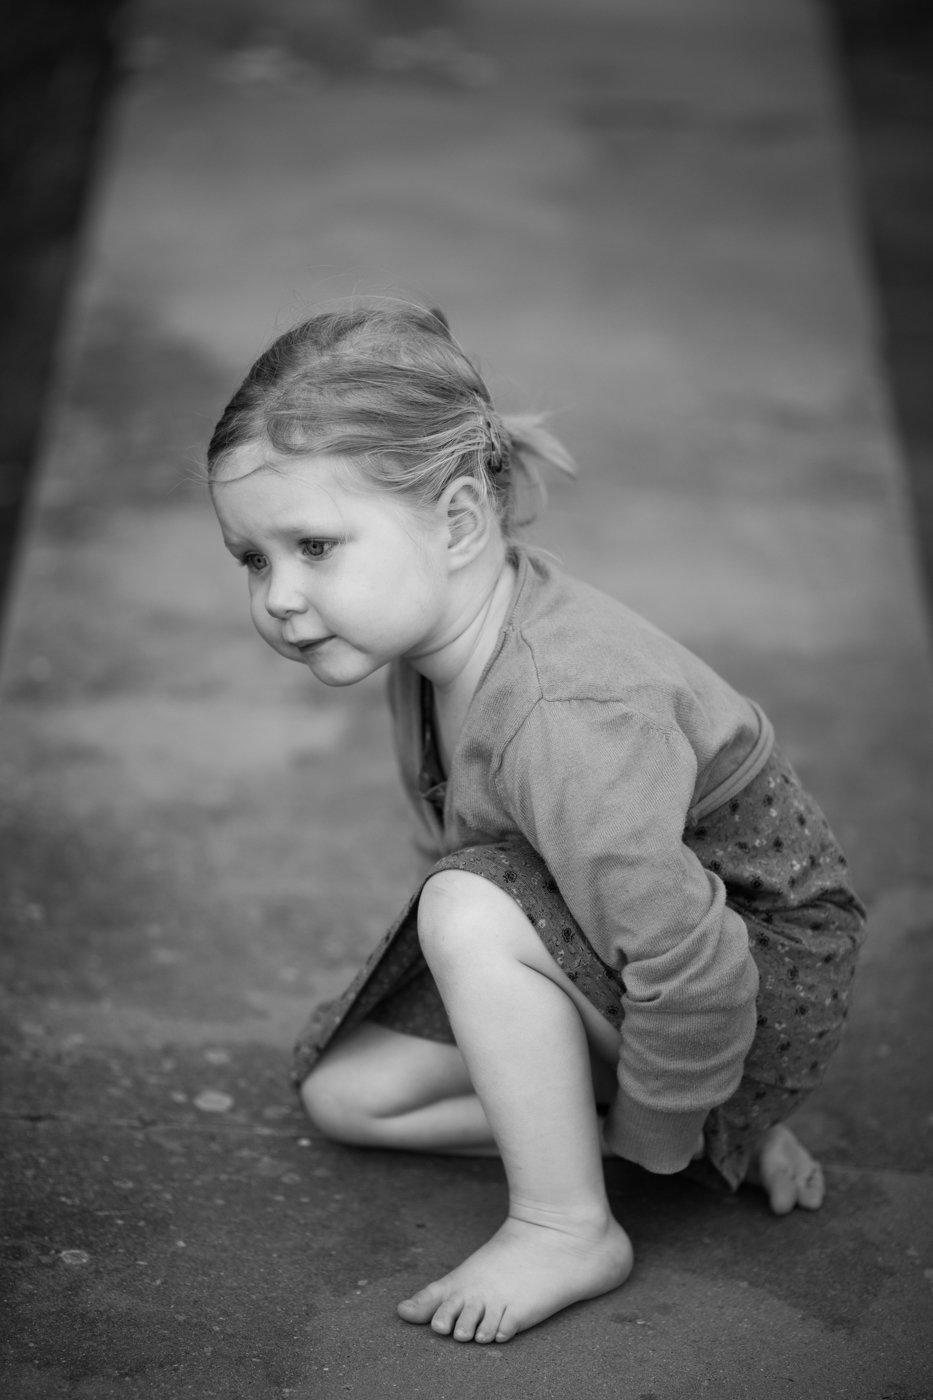 portretfoto jong kind